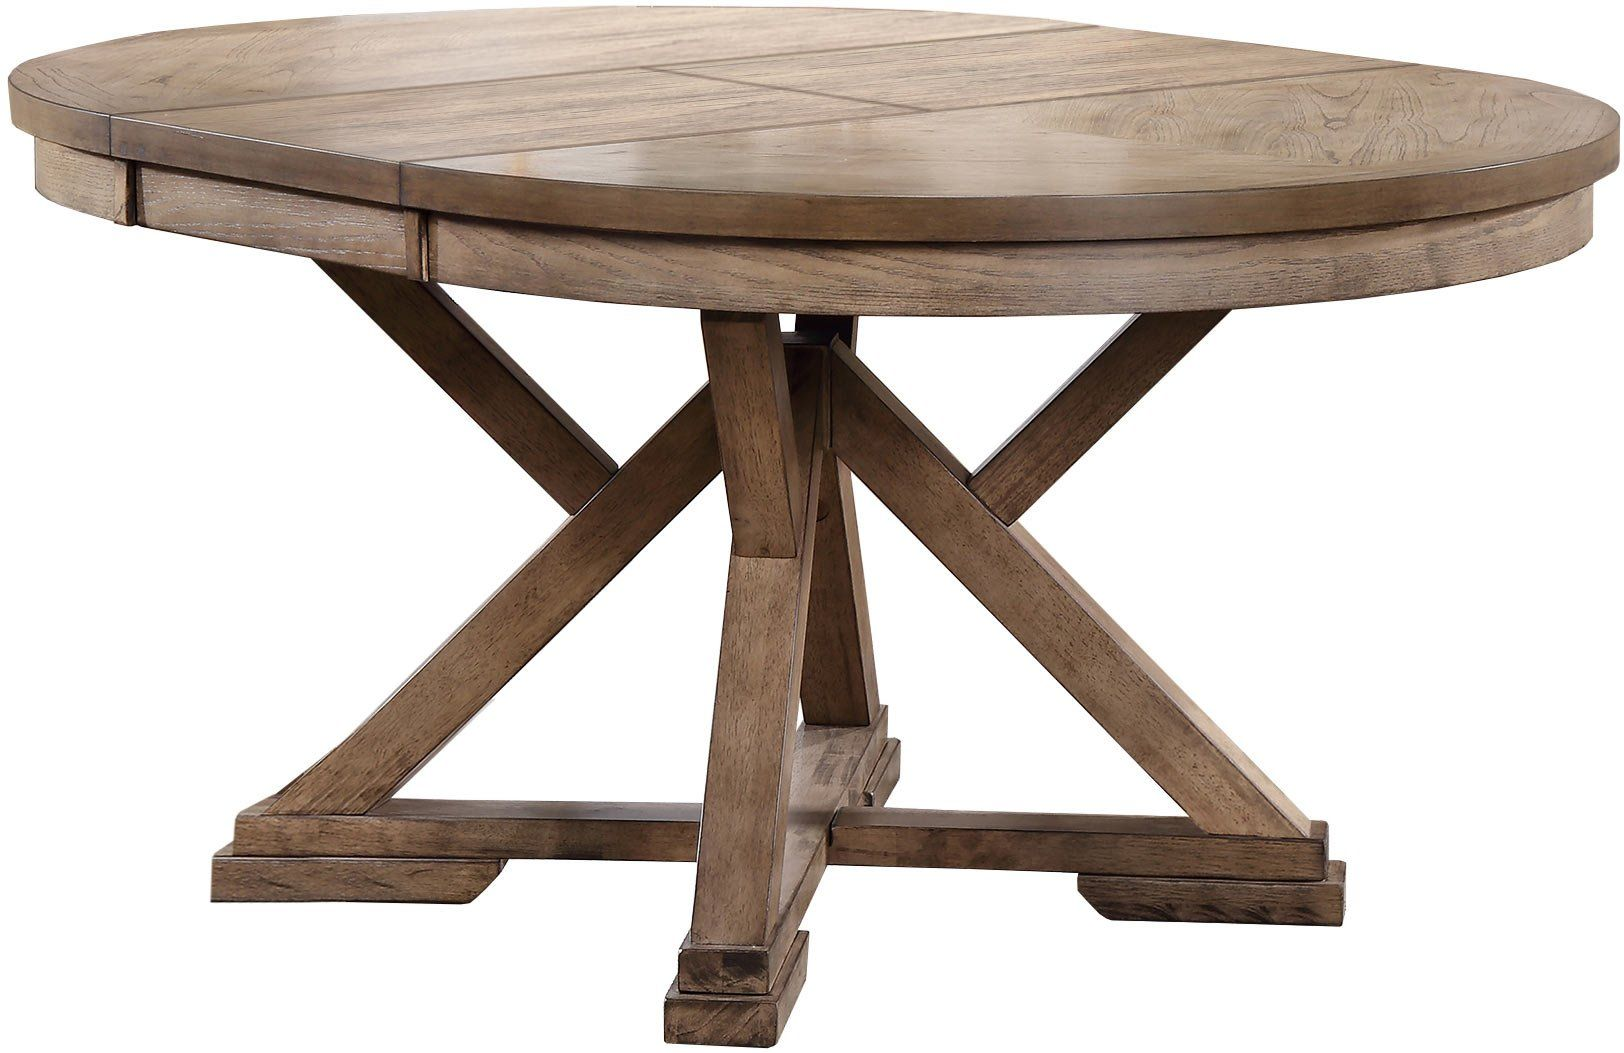 Mushroom Round Dining Table Grandview Rc Willey Furniture Store Round Dining Table Oval Table Dining Dining Table